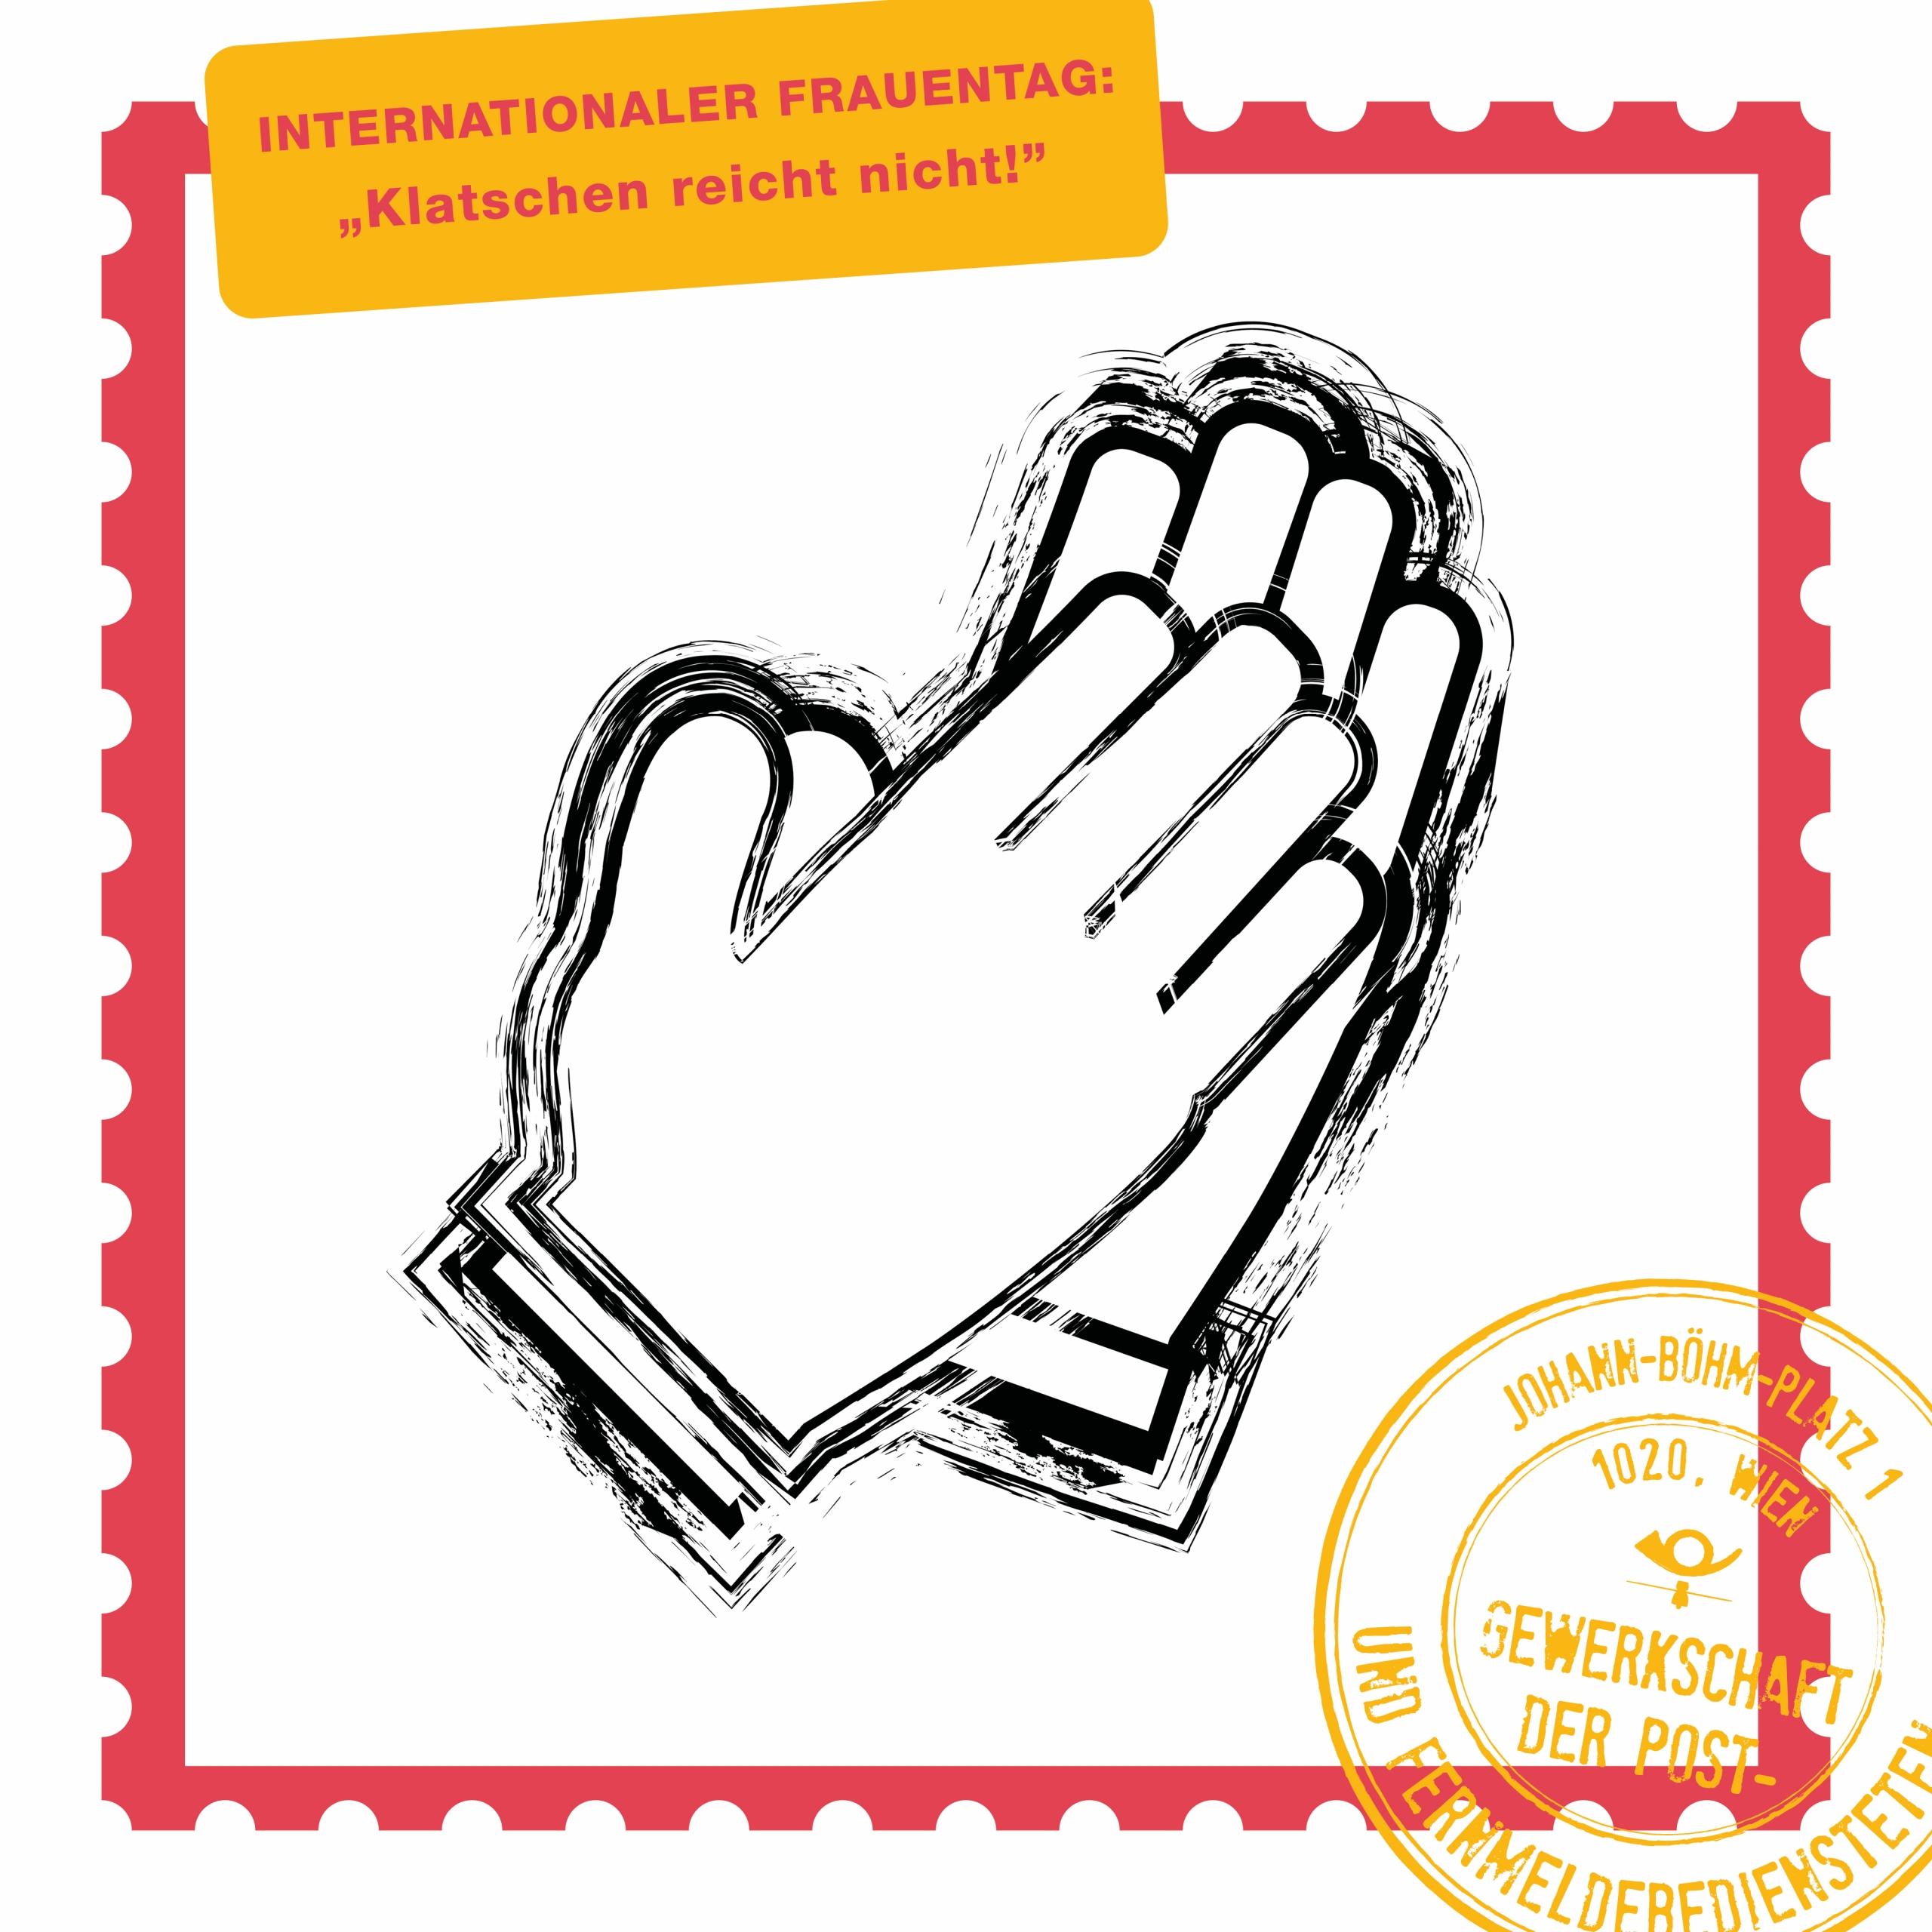 Internationaler Frauentag_Beitragsbild